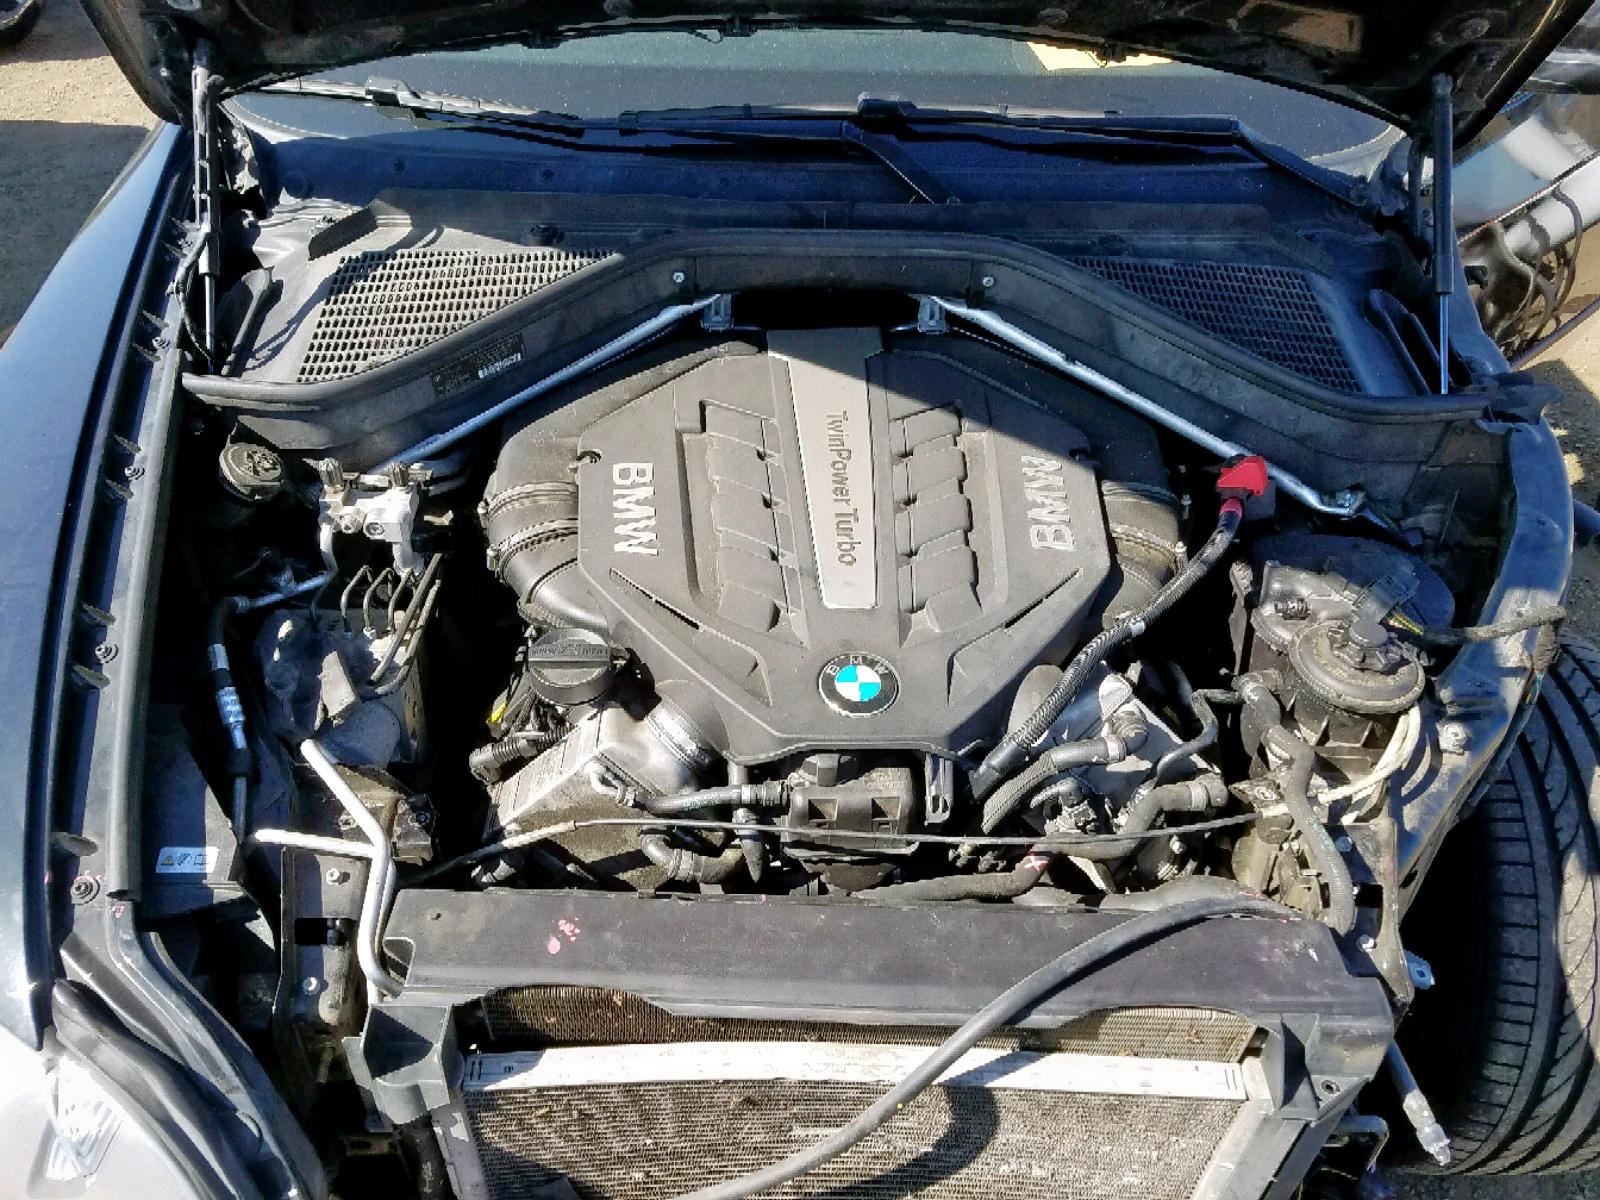 5UXZV8C59D0C17374 - 2013 Bmw X5 Xdrive5 4.4L inside view